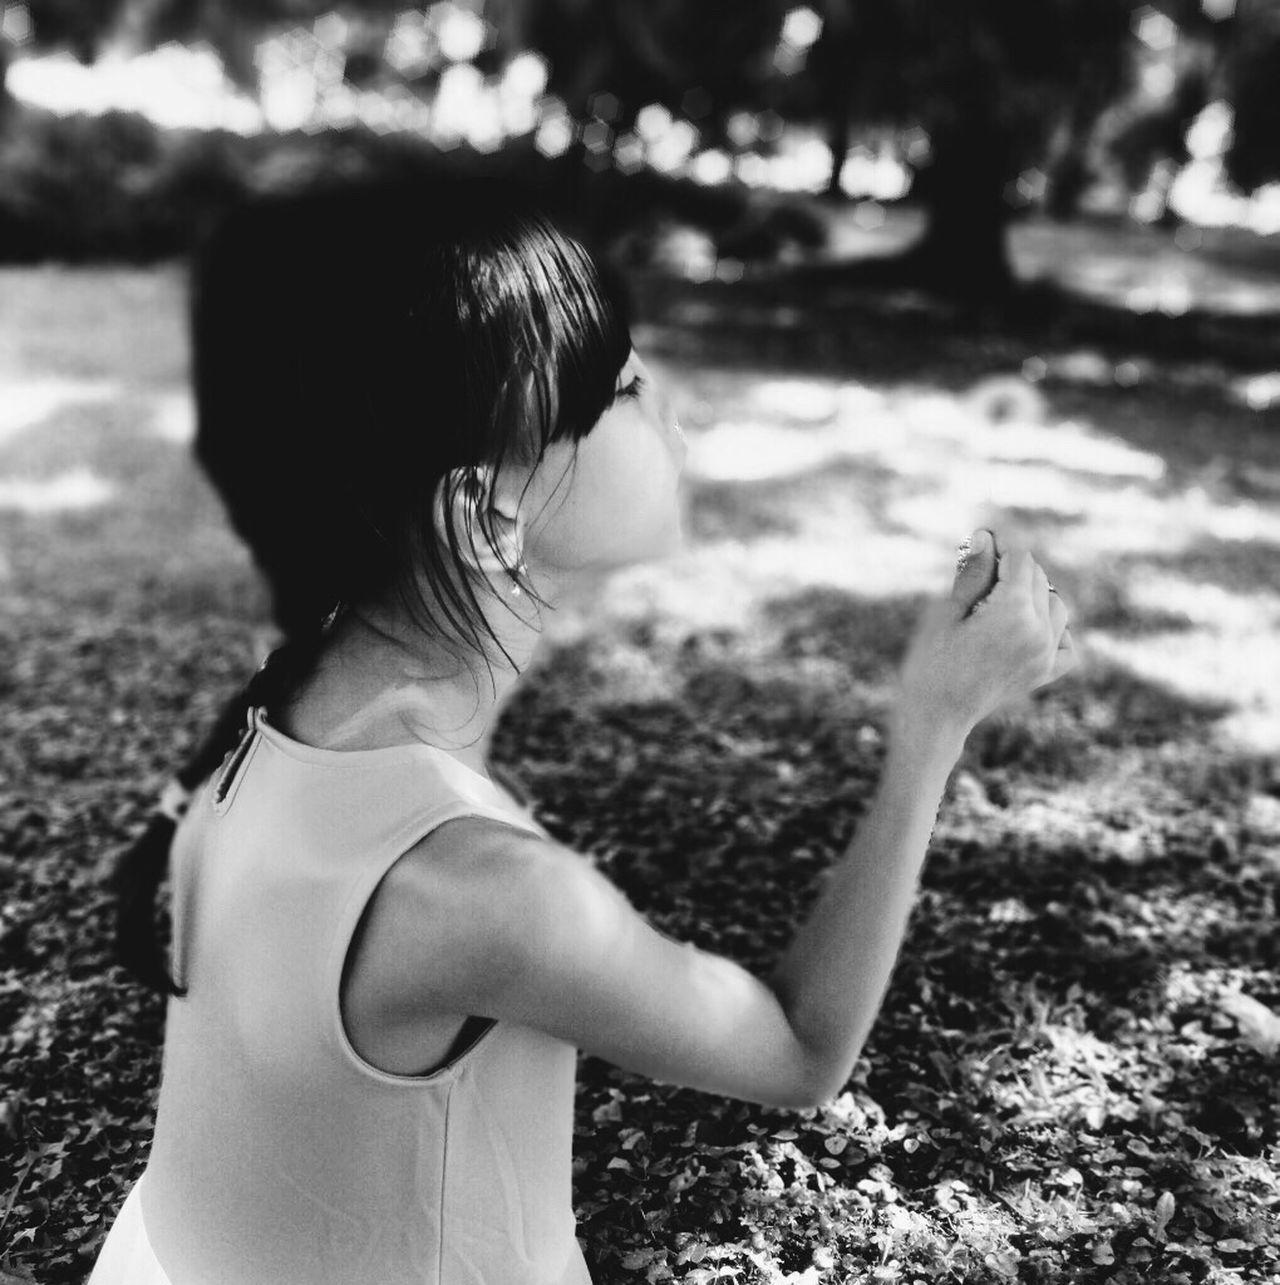 Childhood Whises Blackandwhite Monocrome VSCAM Romanian  Model